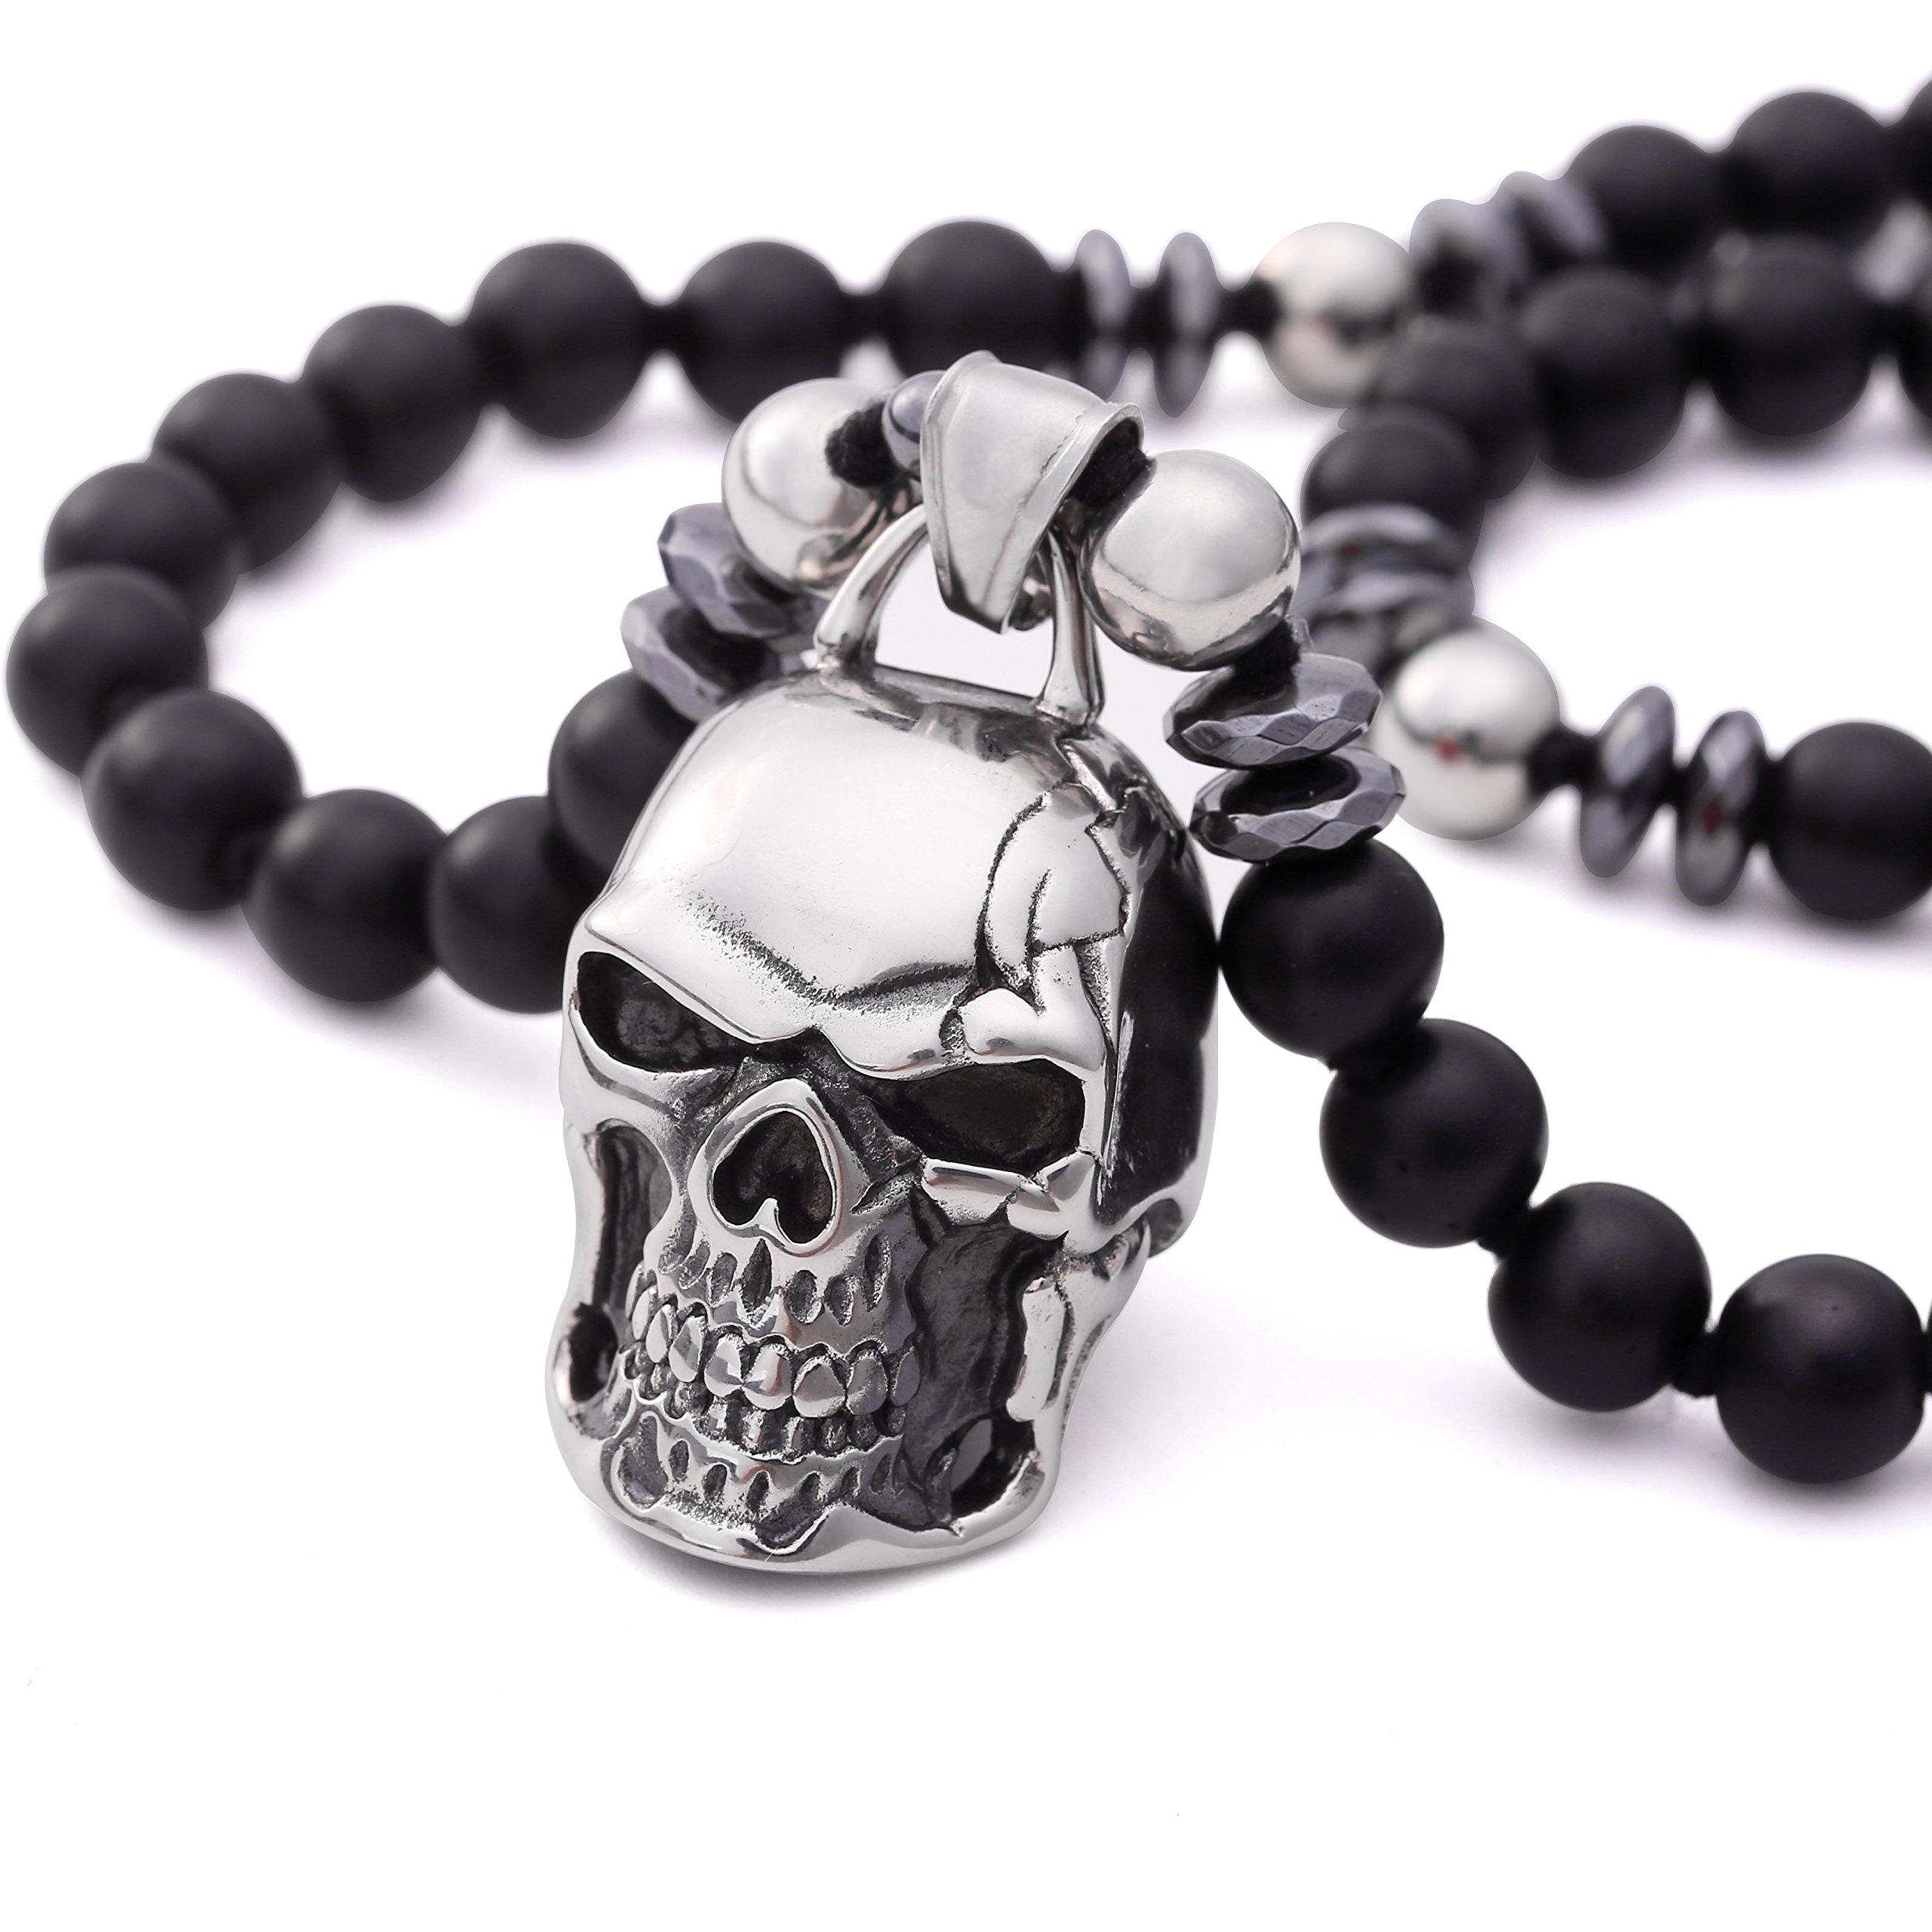 PEARLADA Black Onyx Skull Pendant Necklace Stainless Steel Handmade Gemstone Gothic Hematite Beads Jewelry for Men